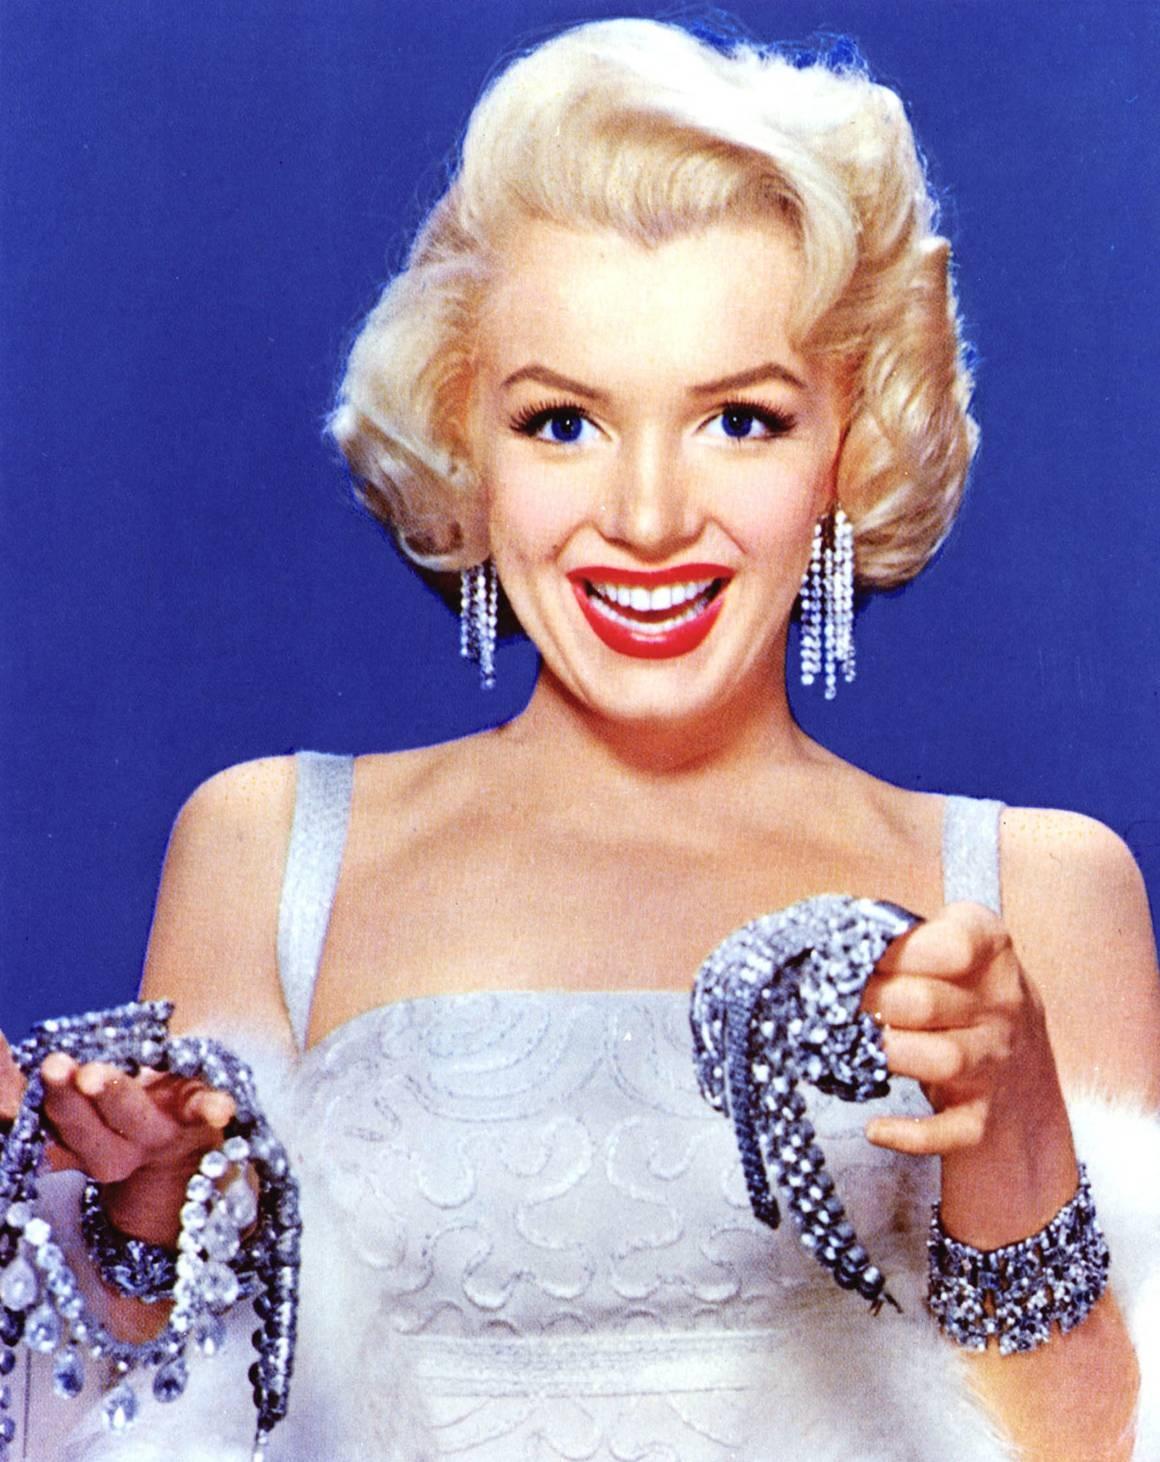 http://1.bp.blogspot.com/-_PEJnHv0acA/Ta4YyEQvNYI/AAAAAAAABCw/KY3nAe0xMQk/s1600/Annex+-+Monroe%252C+Marilyn_NRFPT_084.jpg